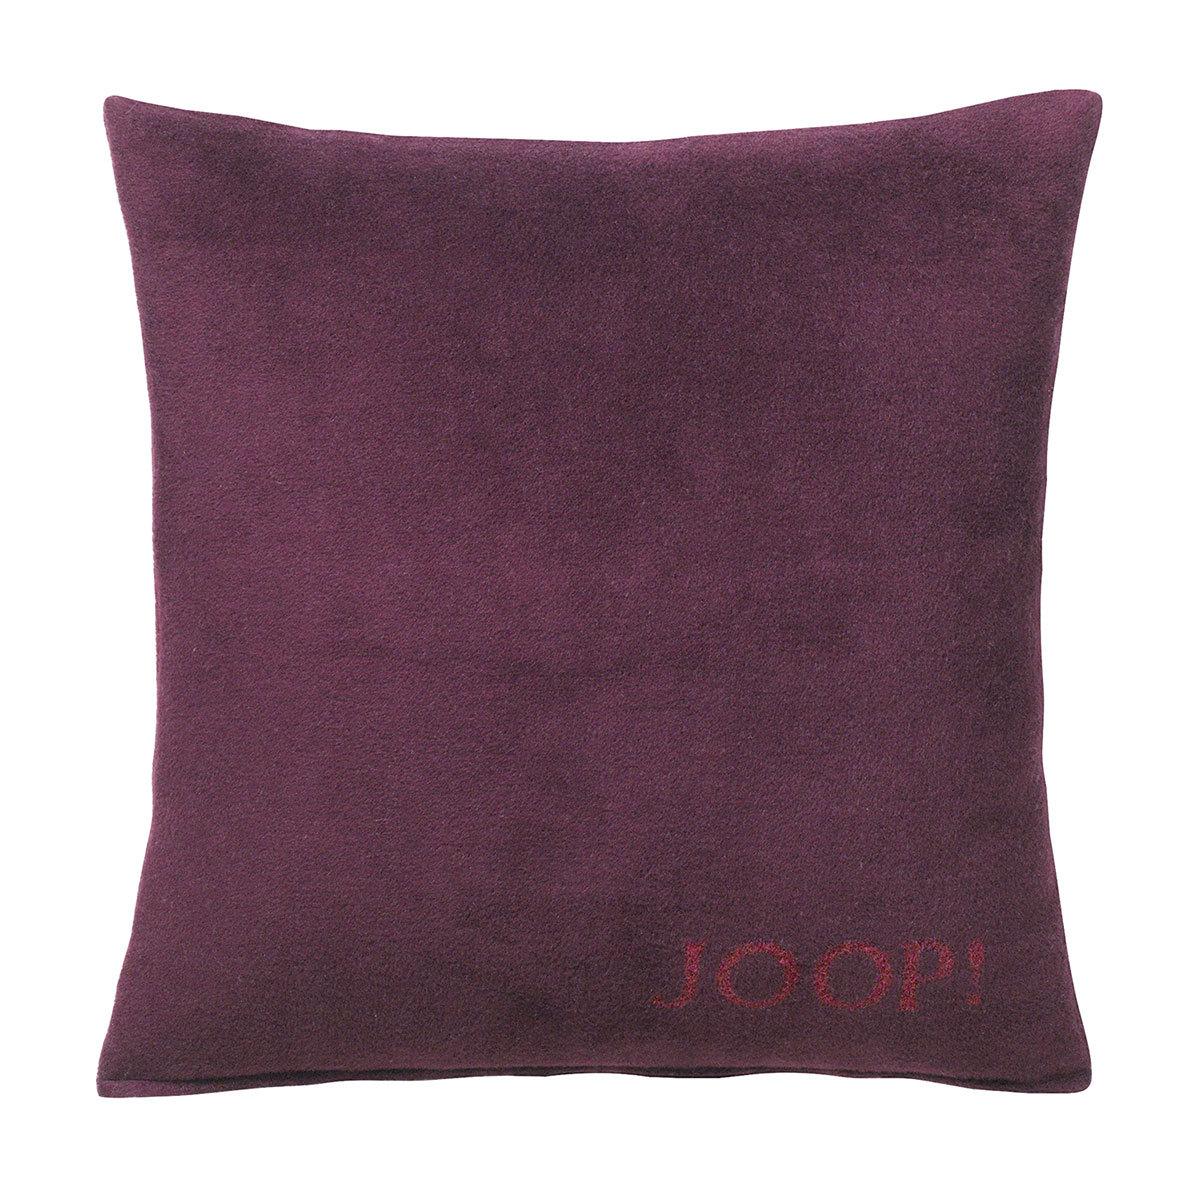 joop uni doubleface kissenh lle feige sangria g nstig online kaufen bei bettwaren shop. Black Bedroom Furniture Sets. Home Design Ideas